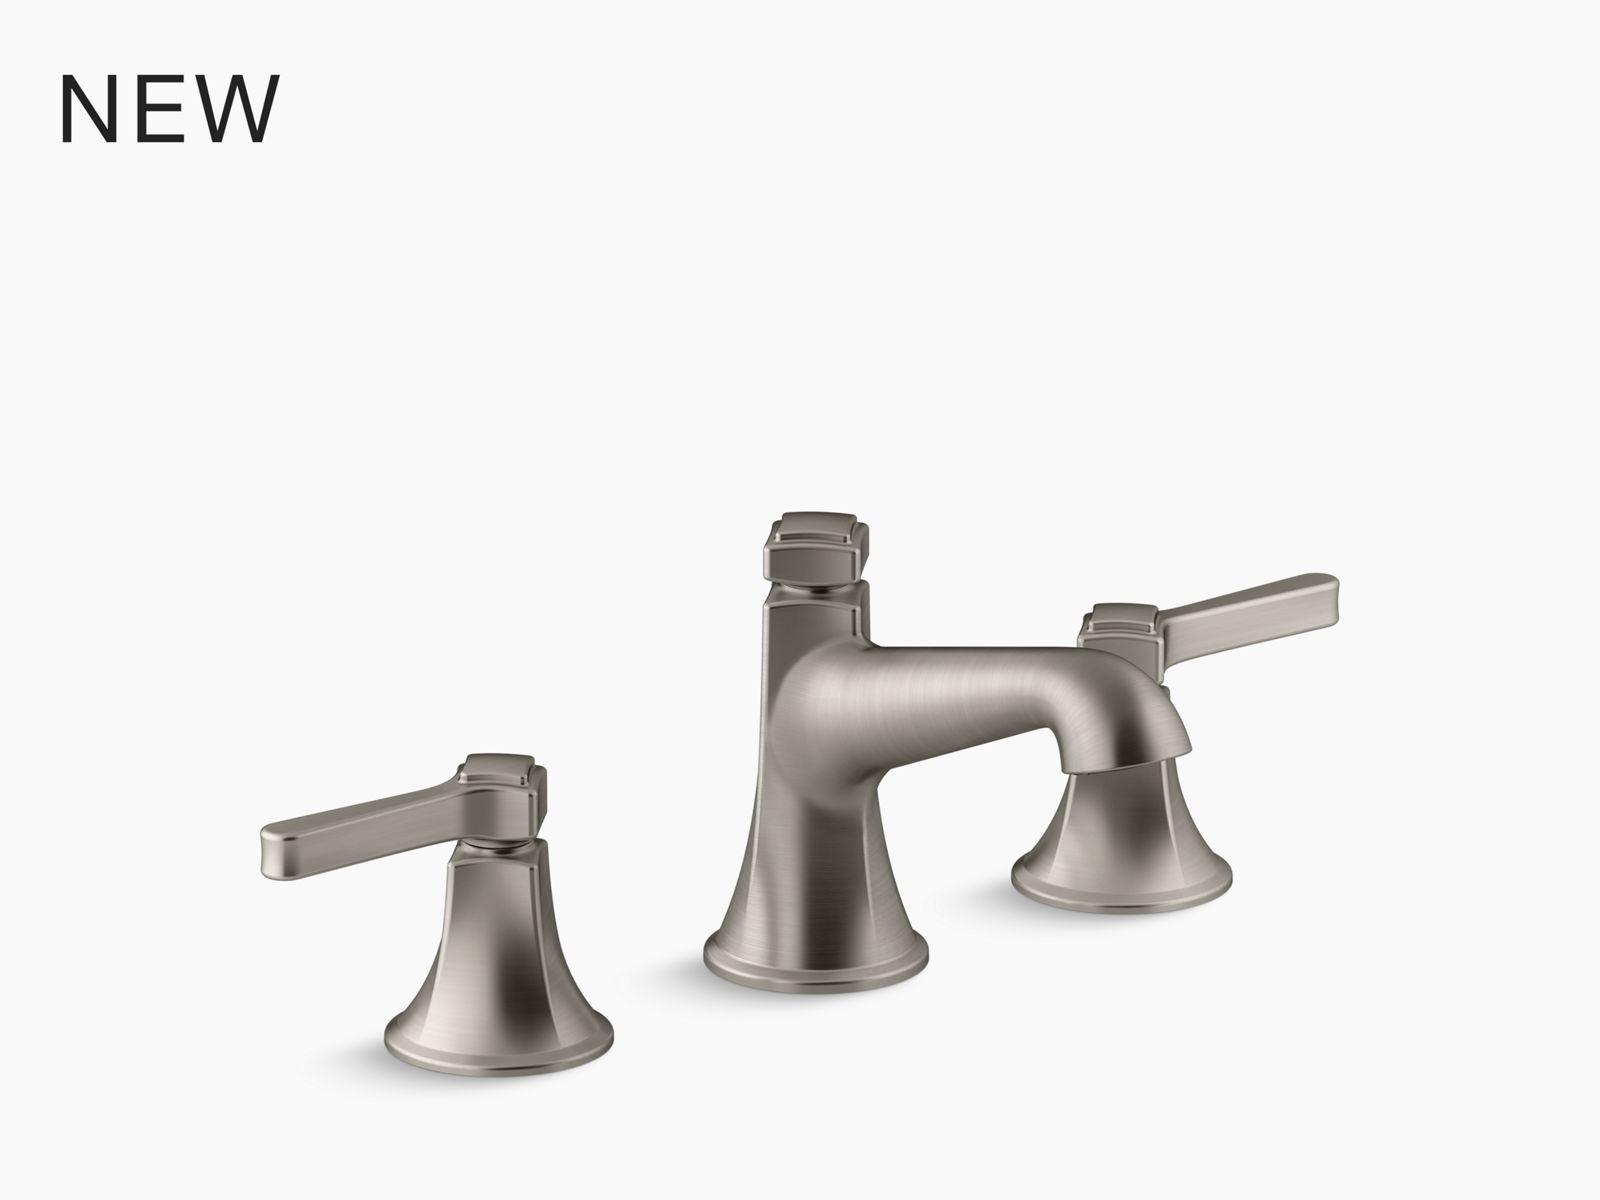 bancroft vertical spray bidet faucet with lever handles